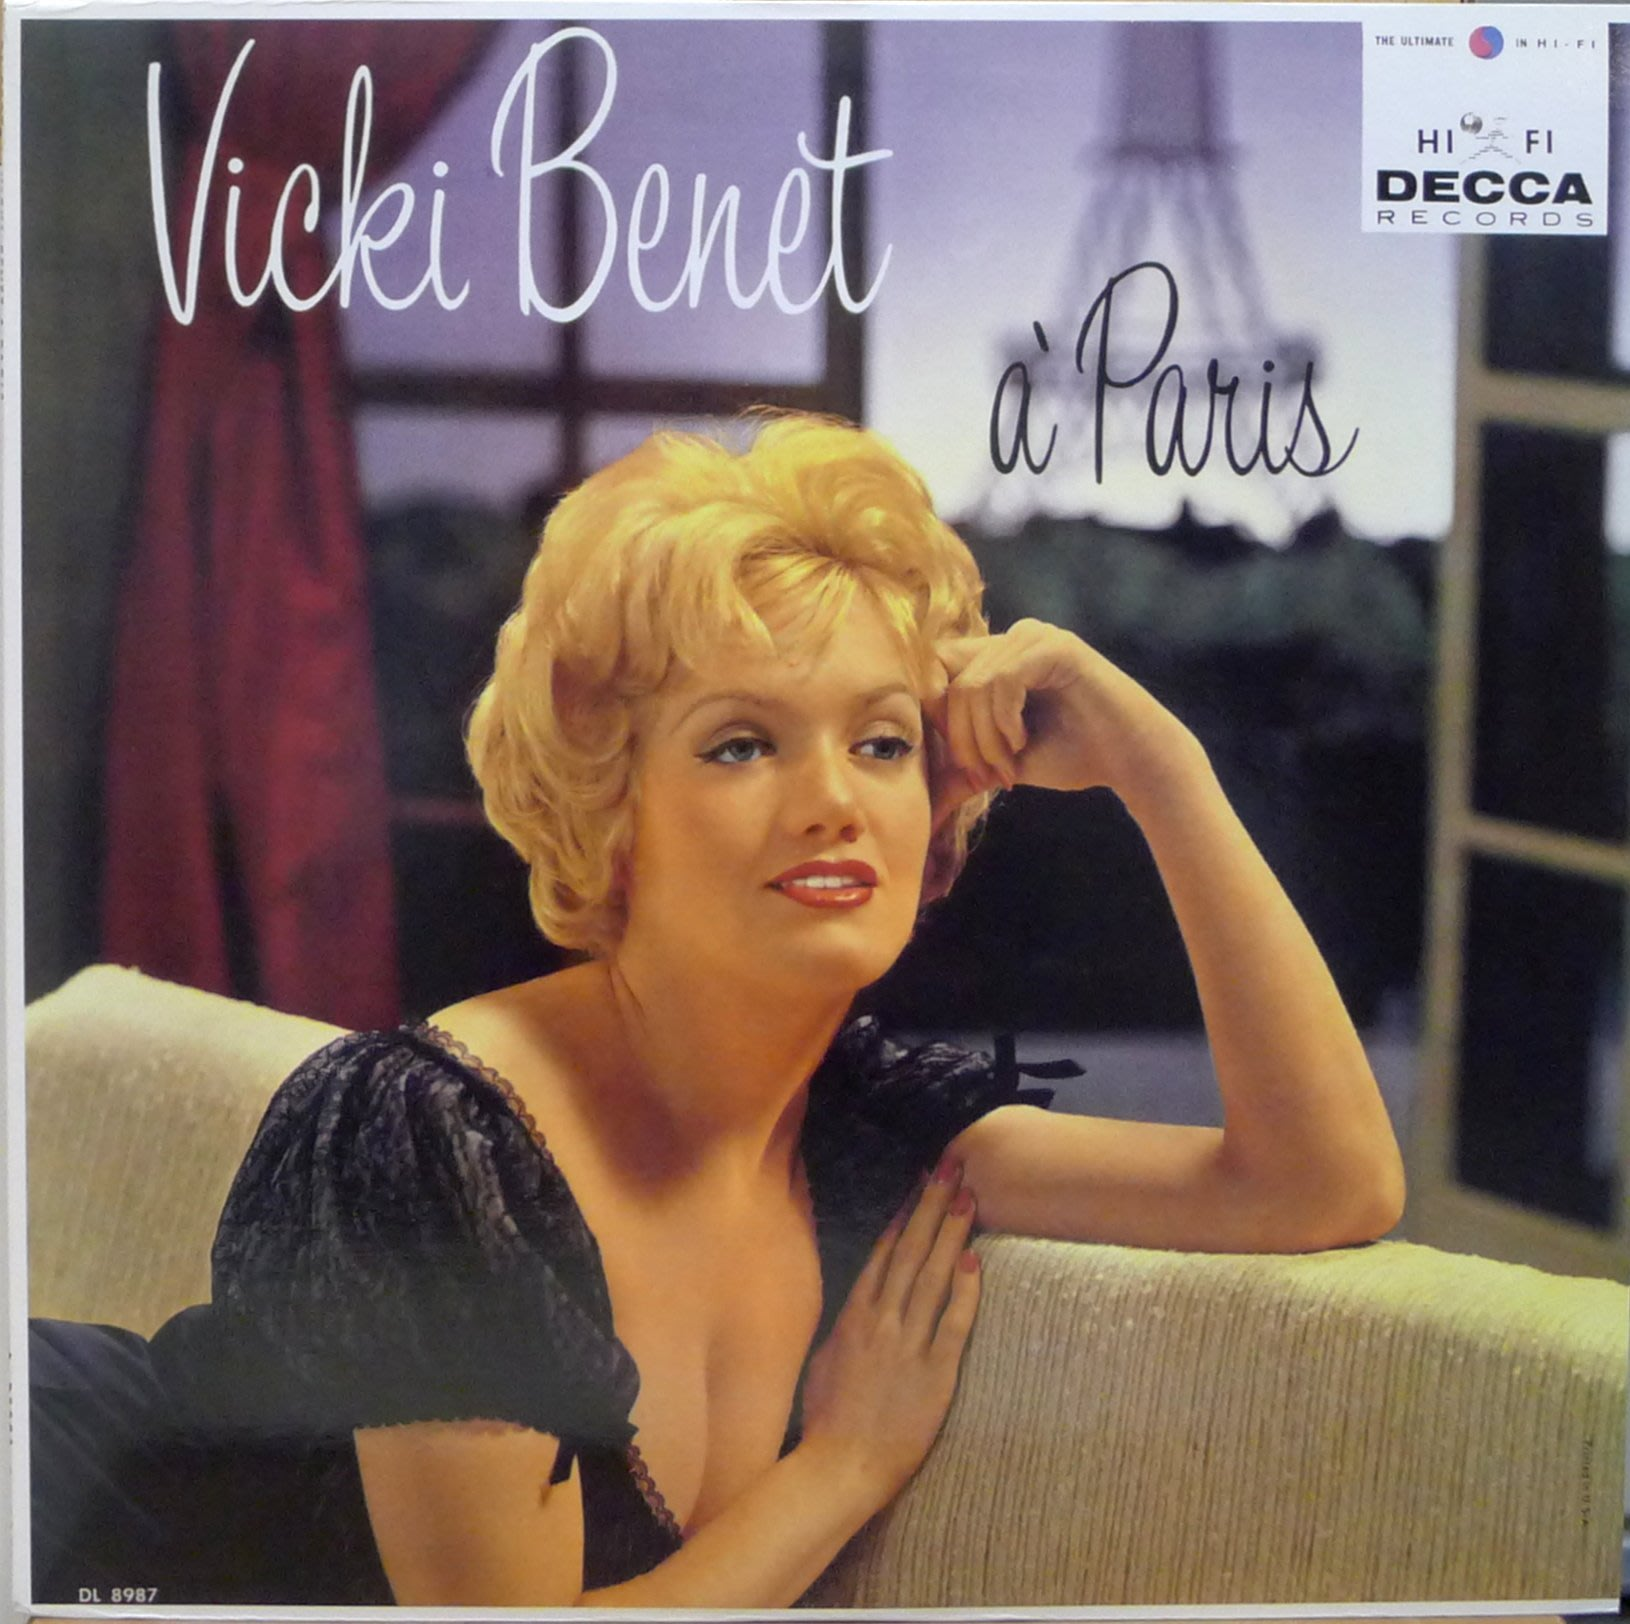 §小宋唱片§ 日版/Vicki Benet A Paris/with Orchestra By Nick Perito